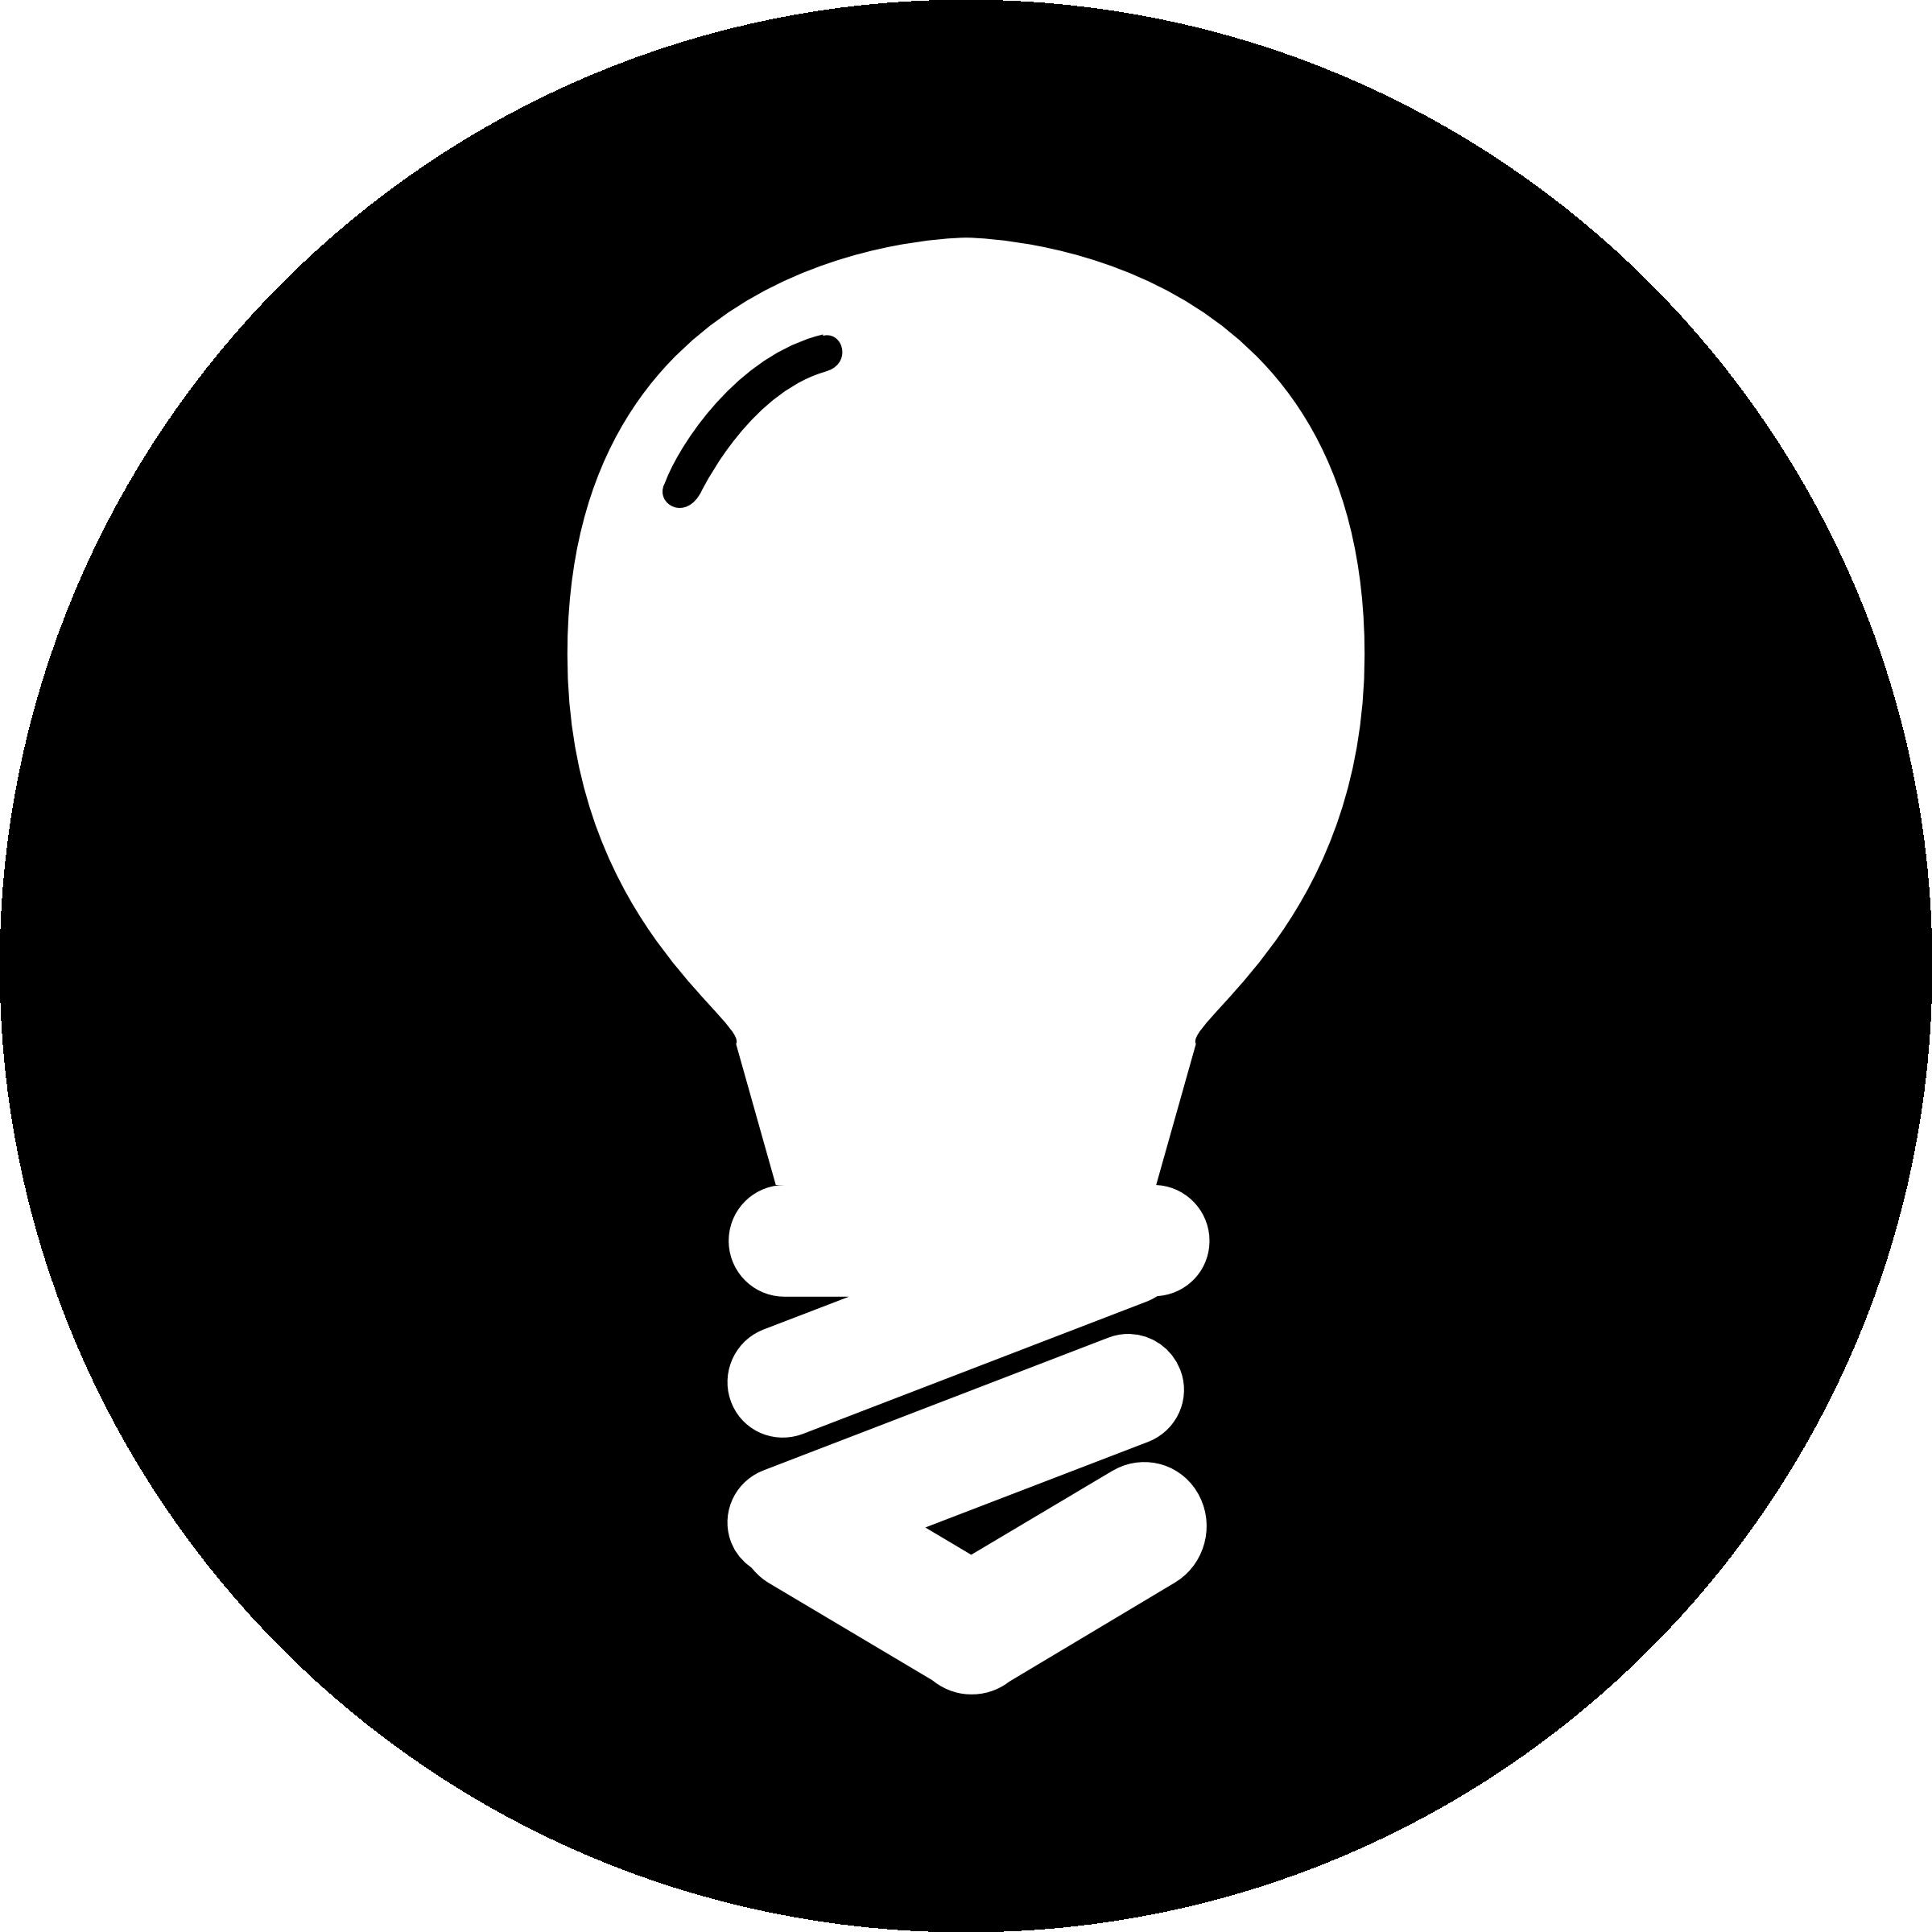 Light Bulb Clip Art Png | Clipart Panda - Free Clipart Images